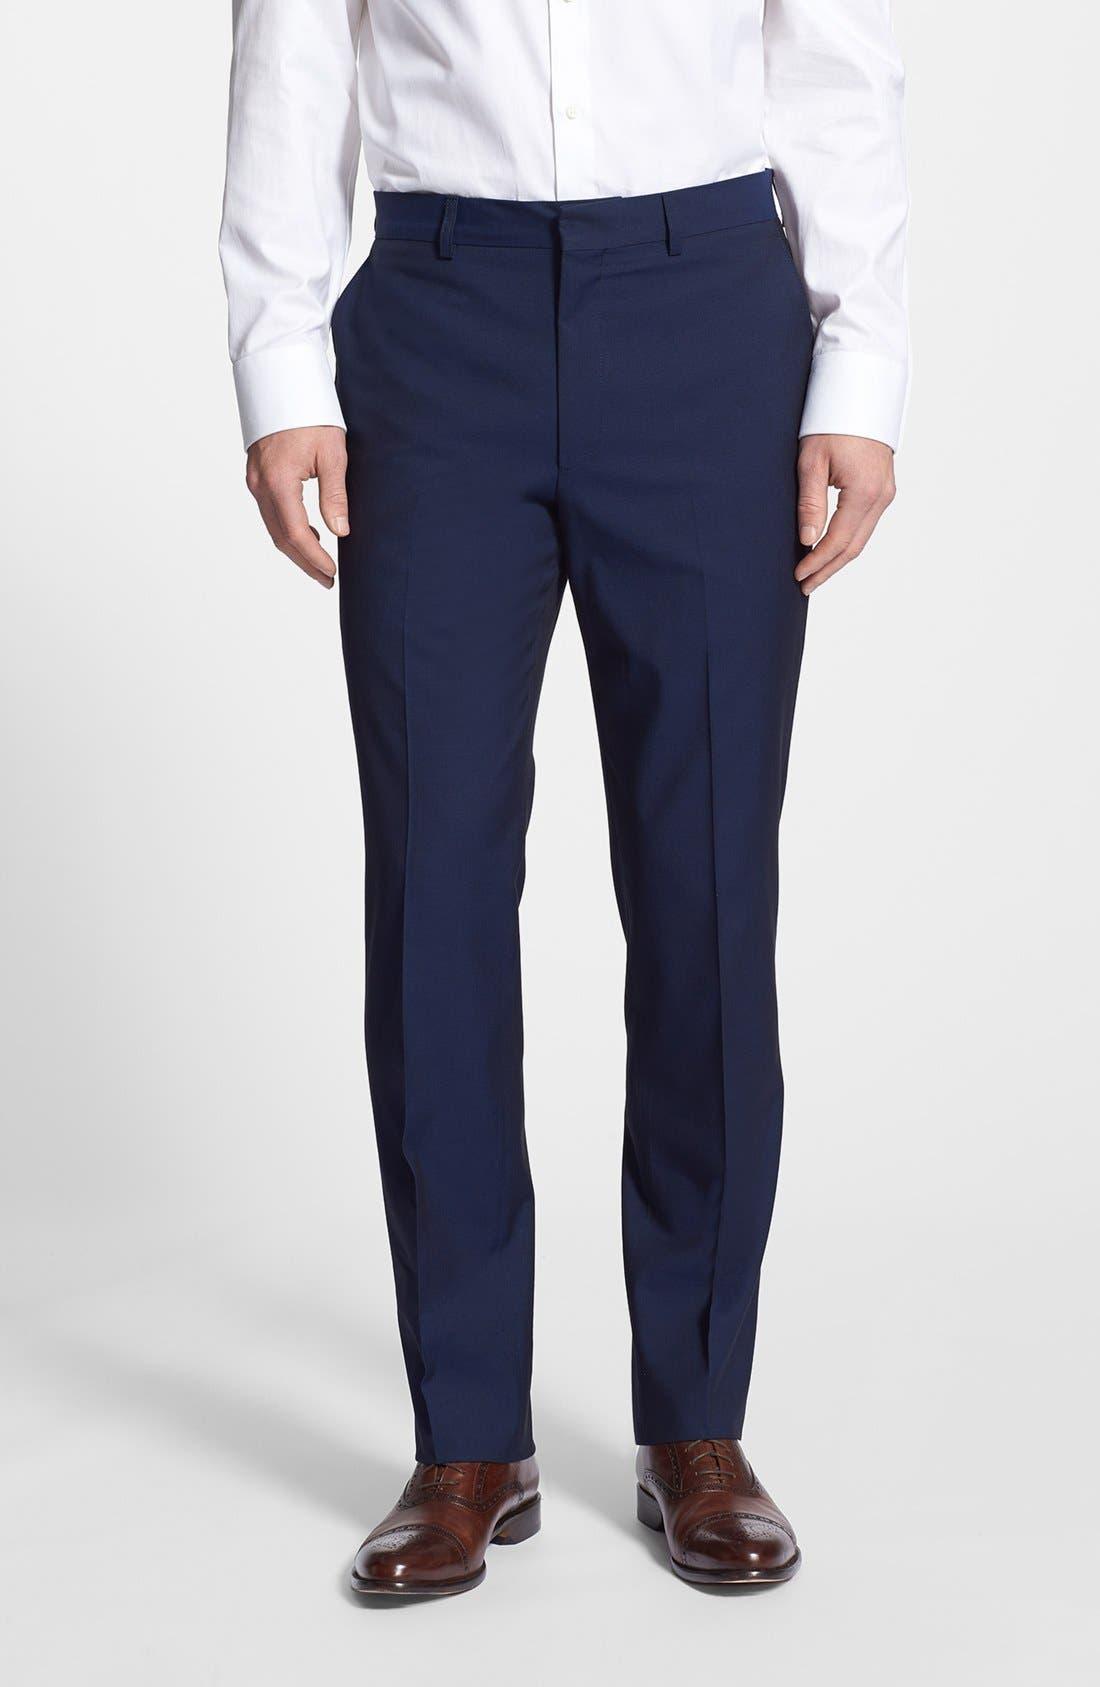 Main Image - Linea Natural Trim Fit Flat Front Cotton Trousers (Nordstrom Exclusive)